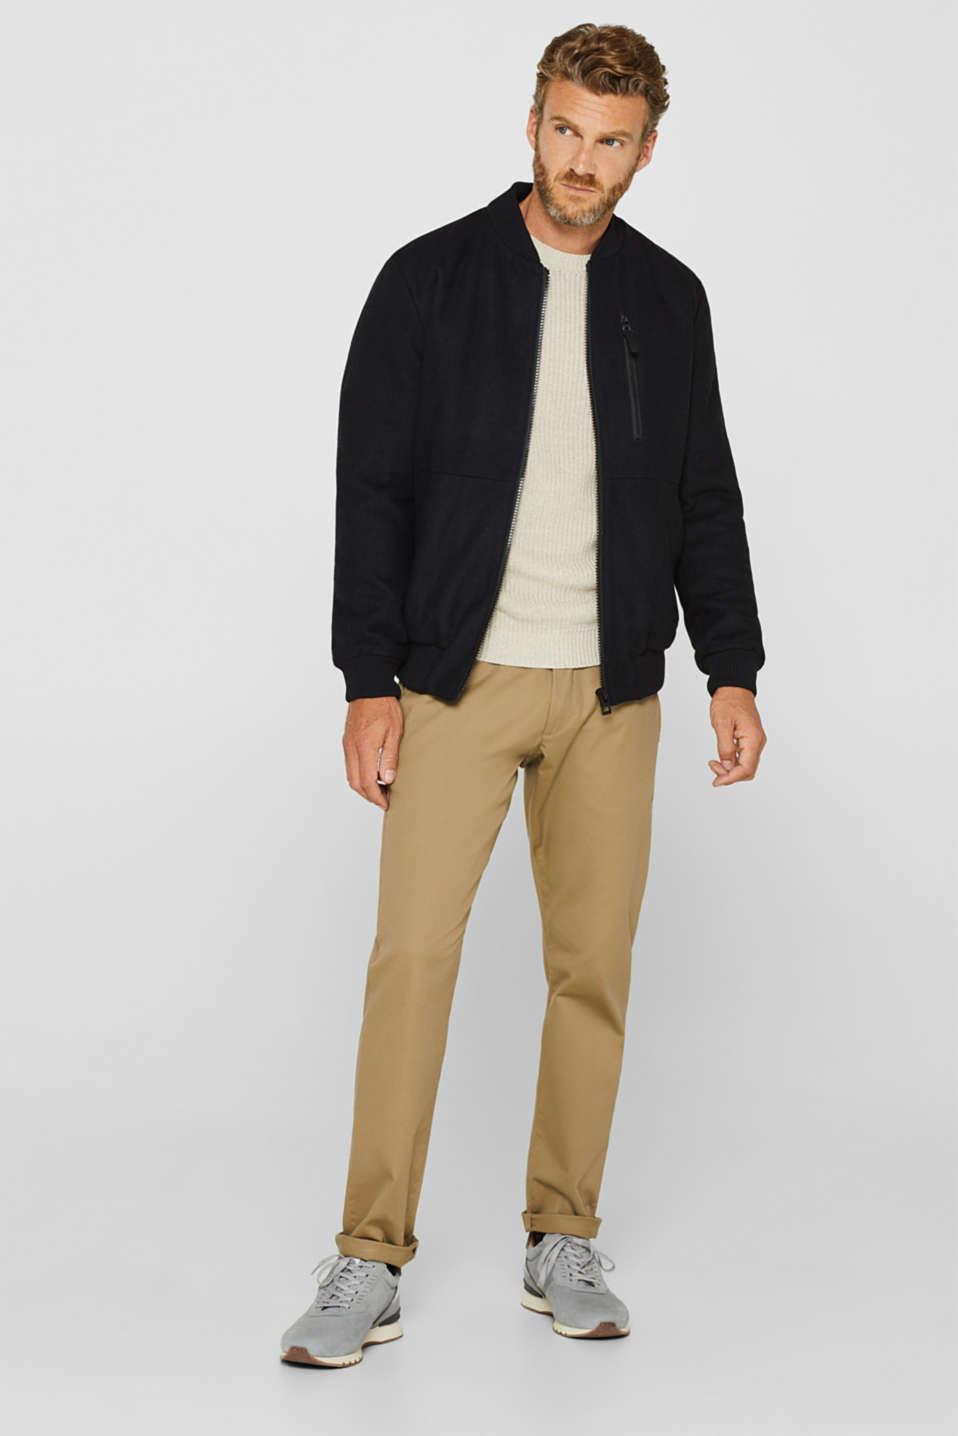 With wool: Jacket with adjustable hood, BLACK, detail image number 1